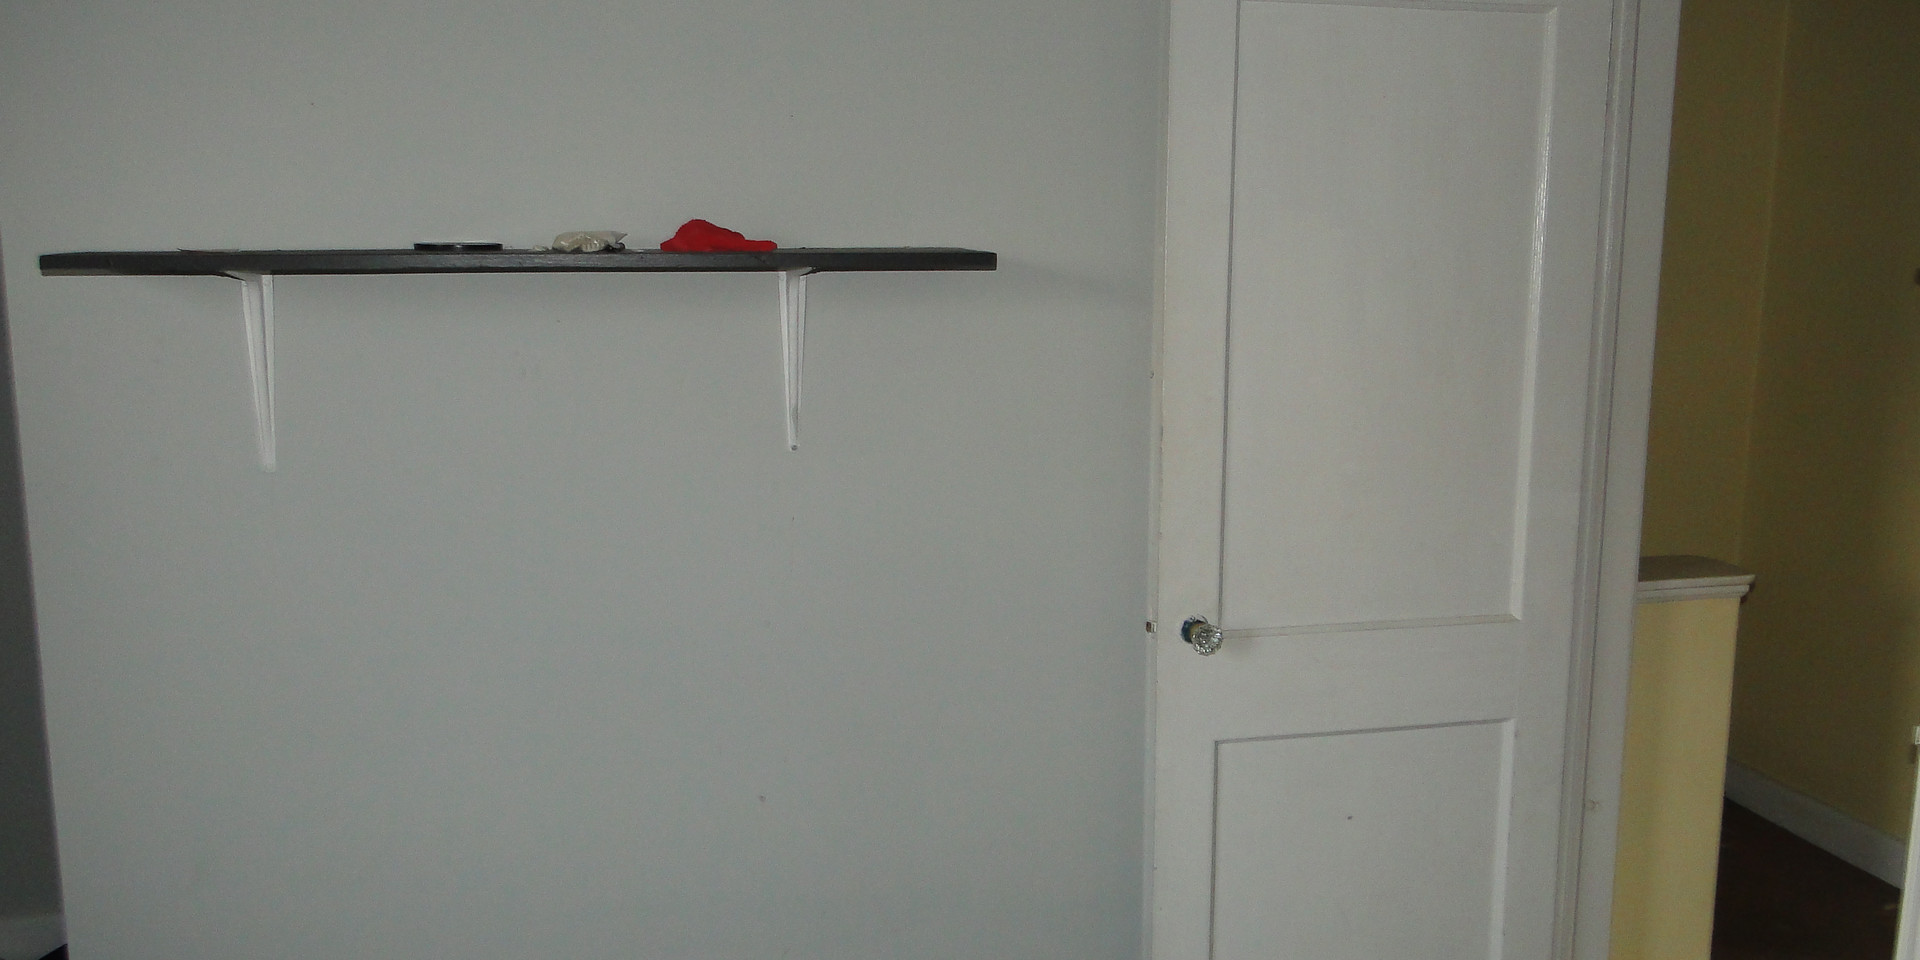 12 - Second Bedroom 4.JPG